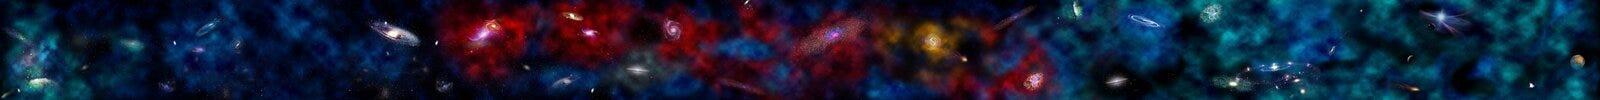 Universo de la estrella del fondo libre illustration